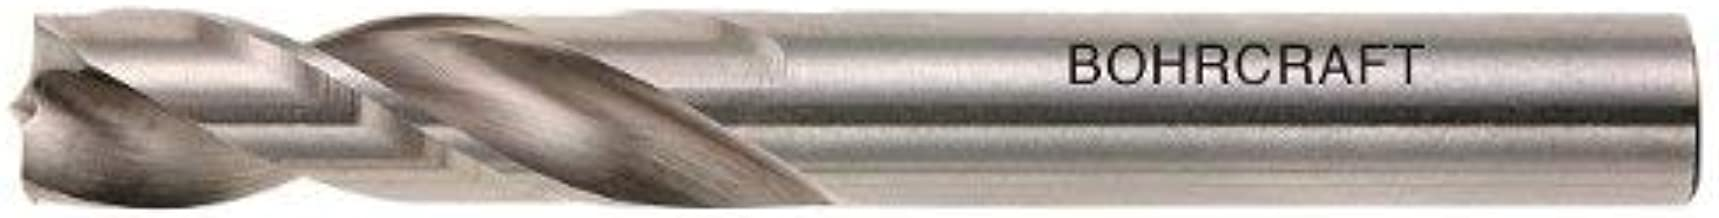 HSS-E 1/piece 18010300800. Bohrcraft spot weld drill bit Co 5/% professional plus 8.0/x 79 mm in pack of 1